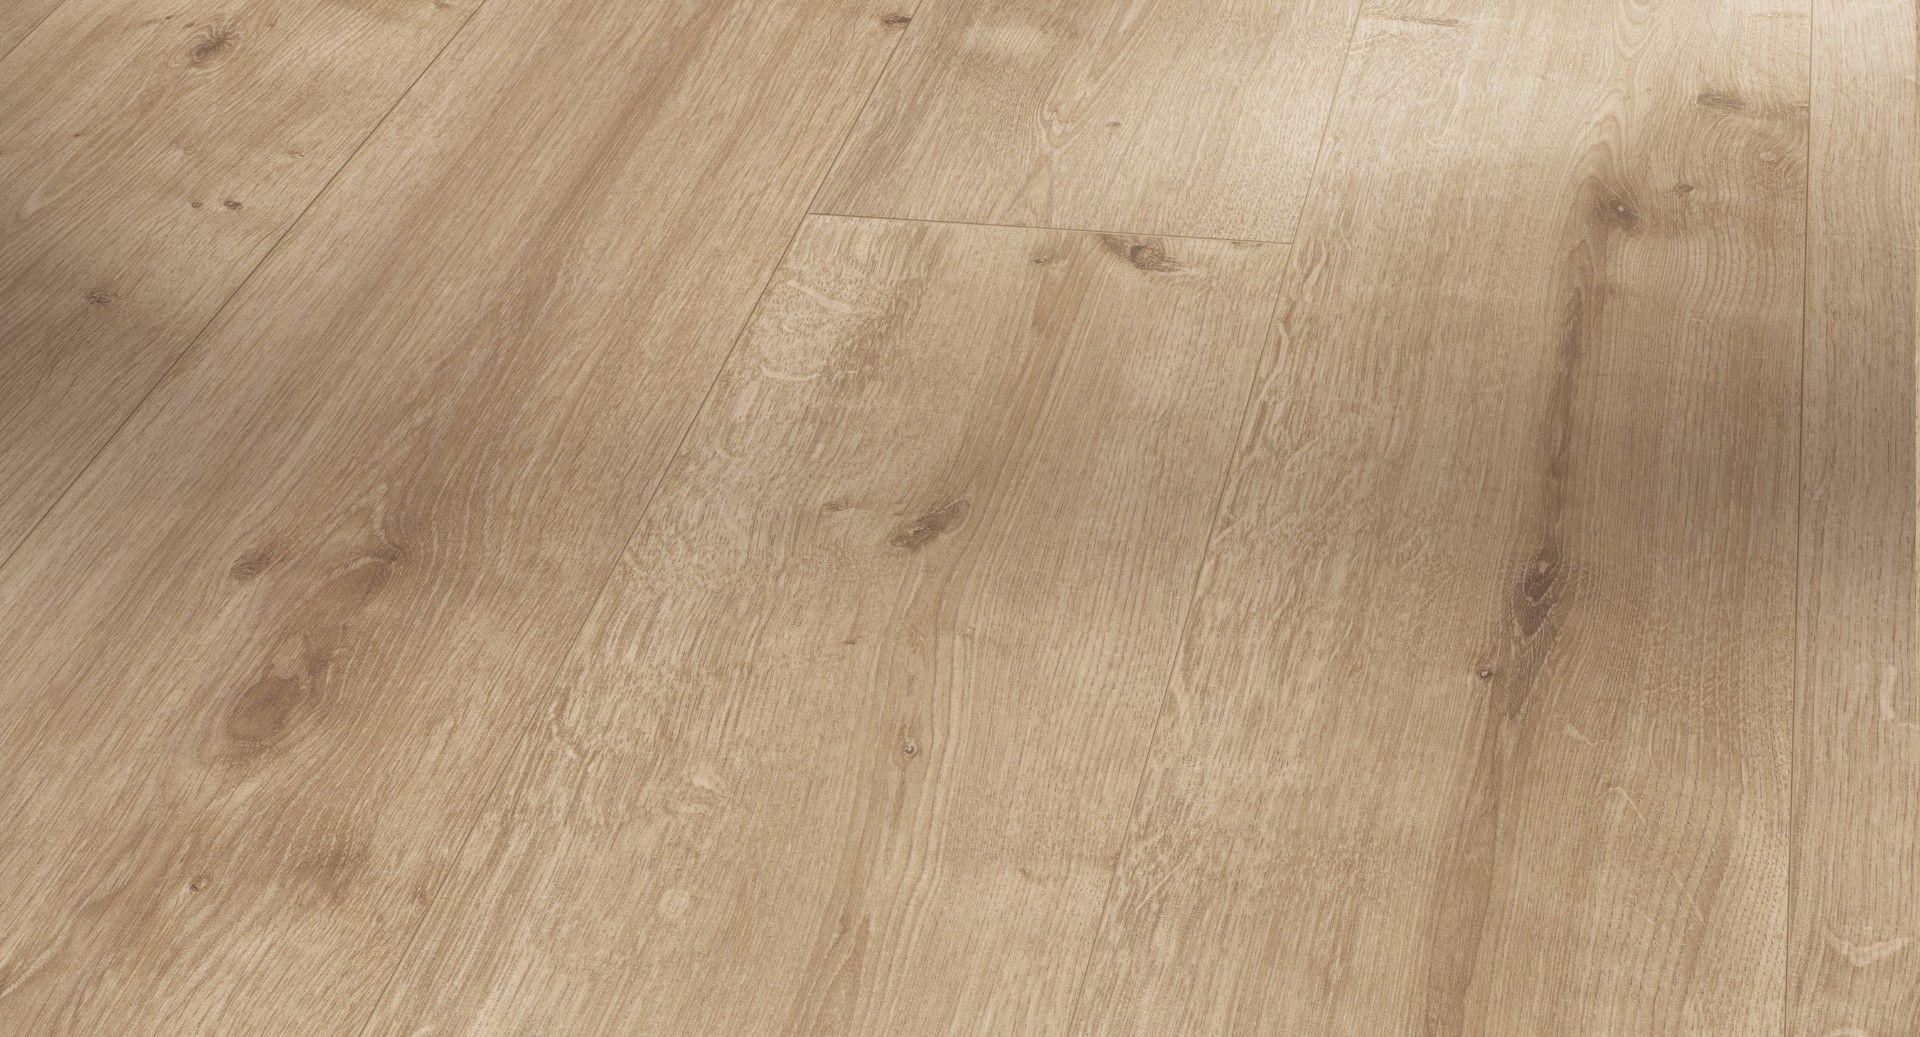 Oak sanded in 2020 Flooring, Laminate flooring, Flooring